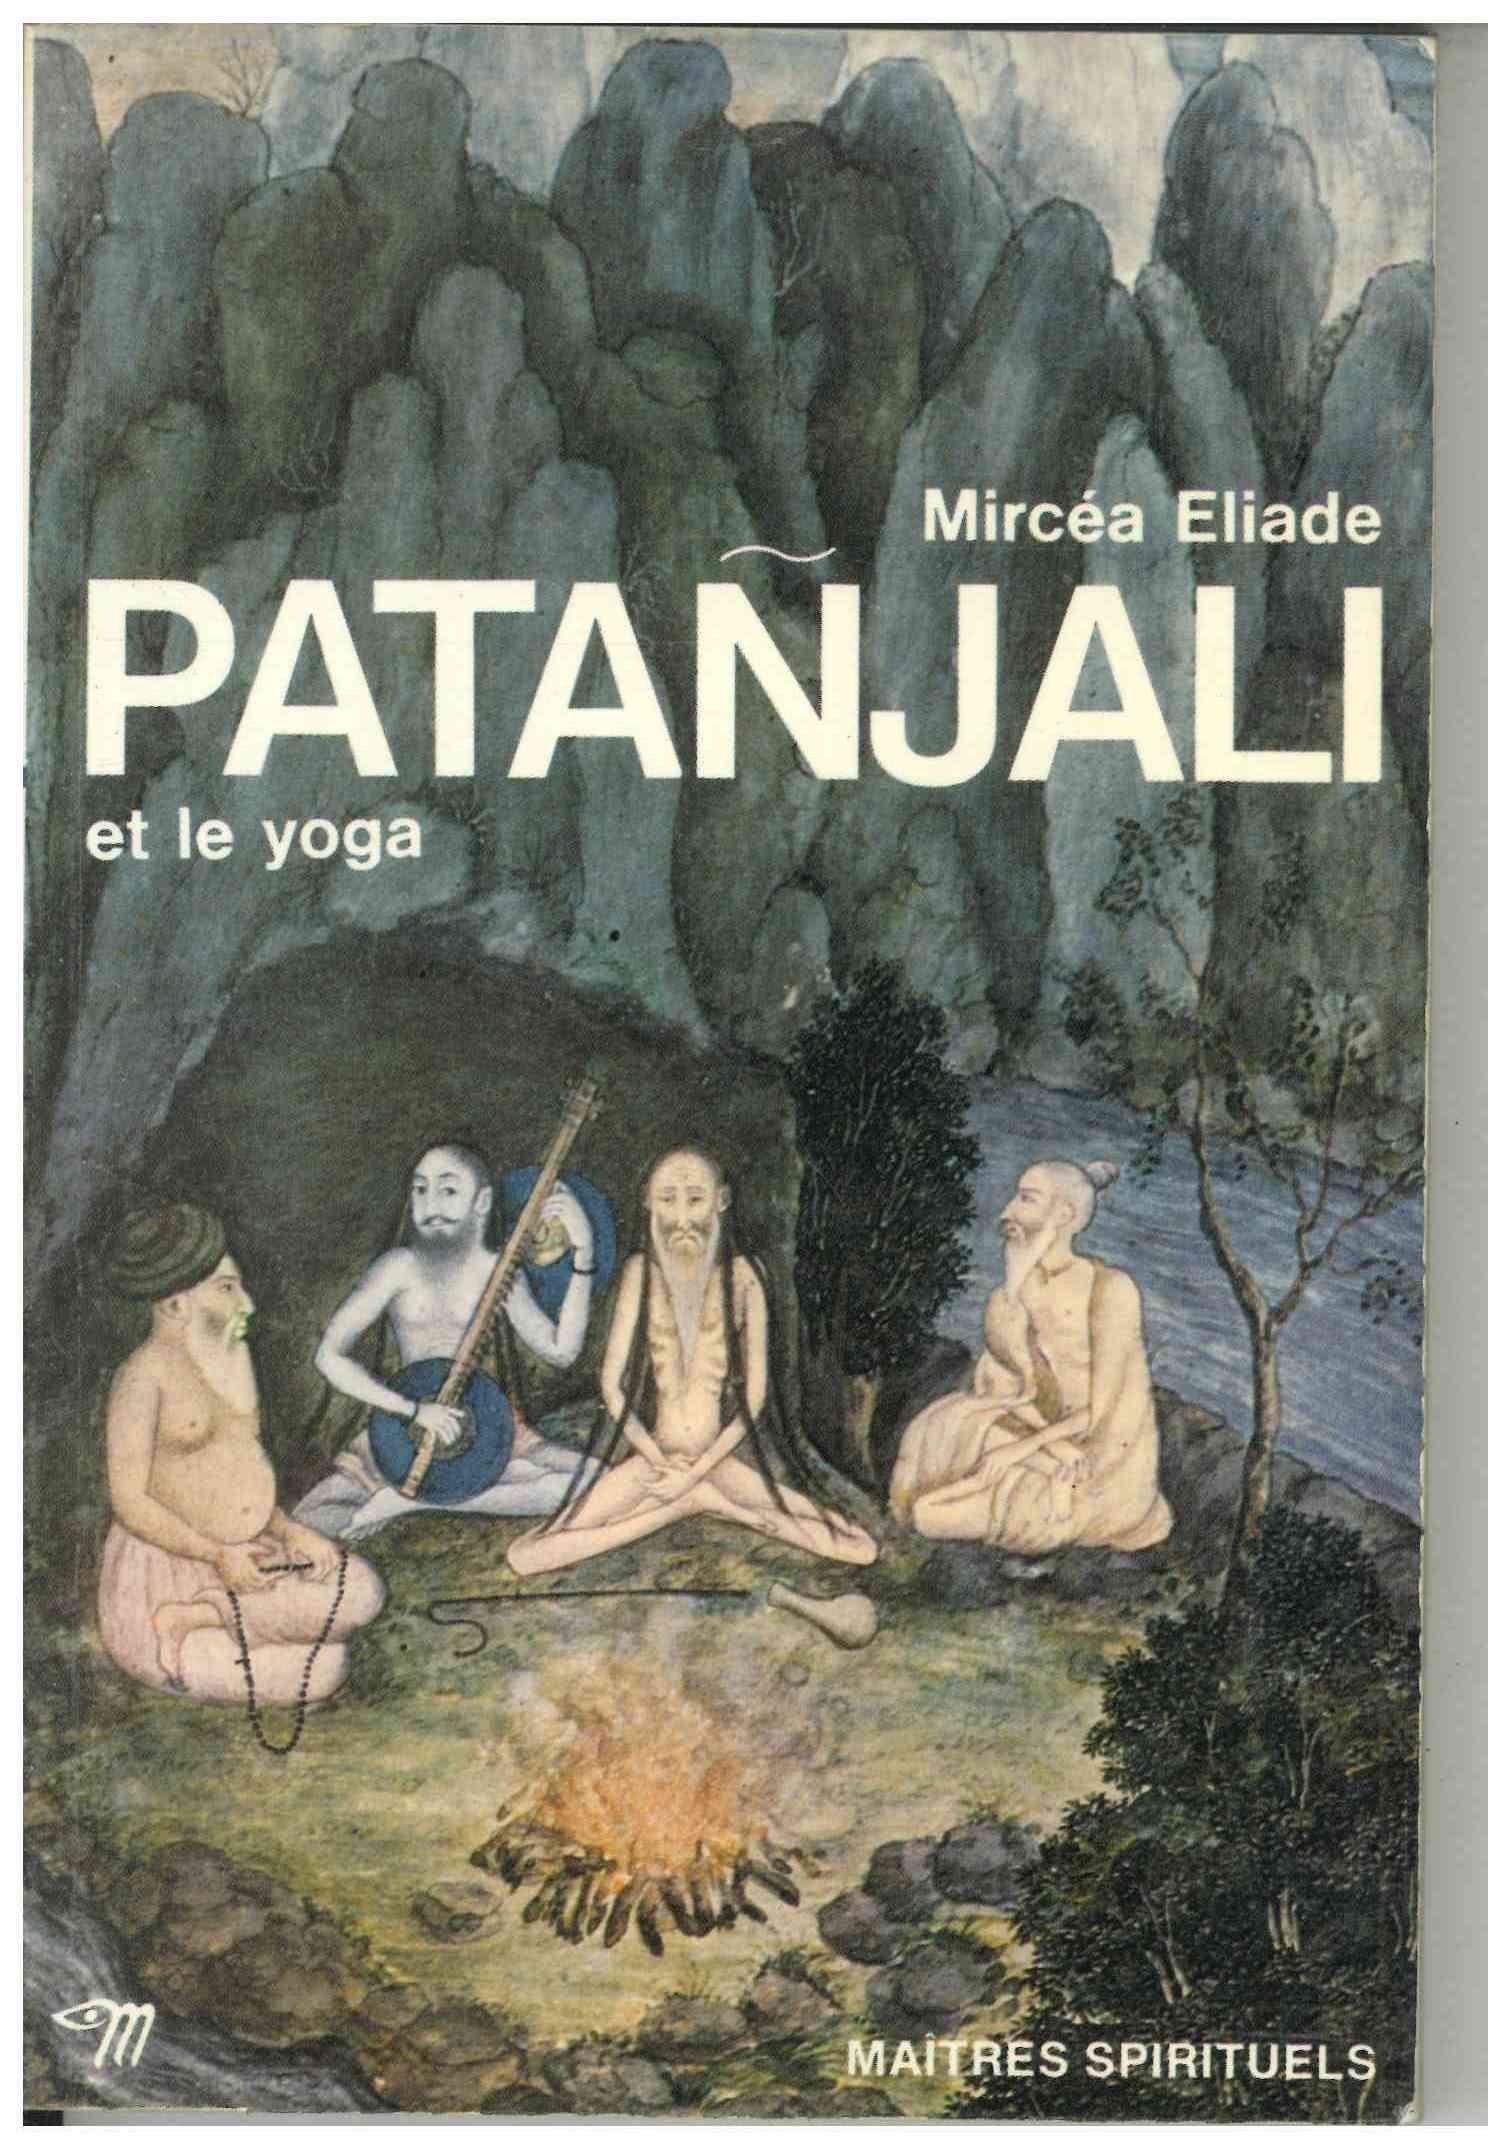 Patanjali et le yoga.: Amazon.es: Libros